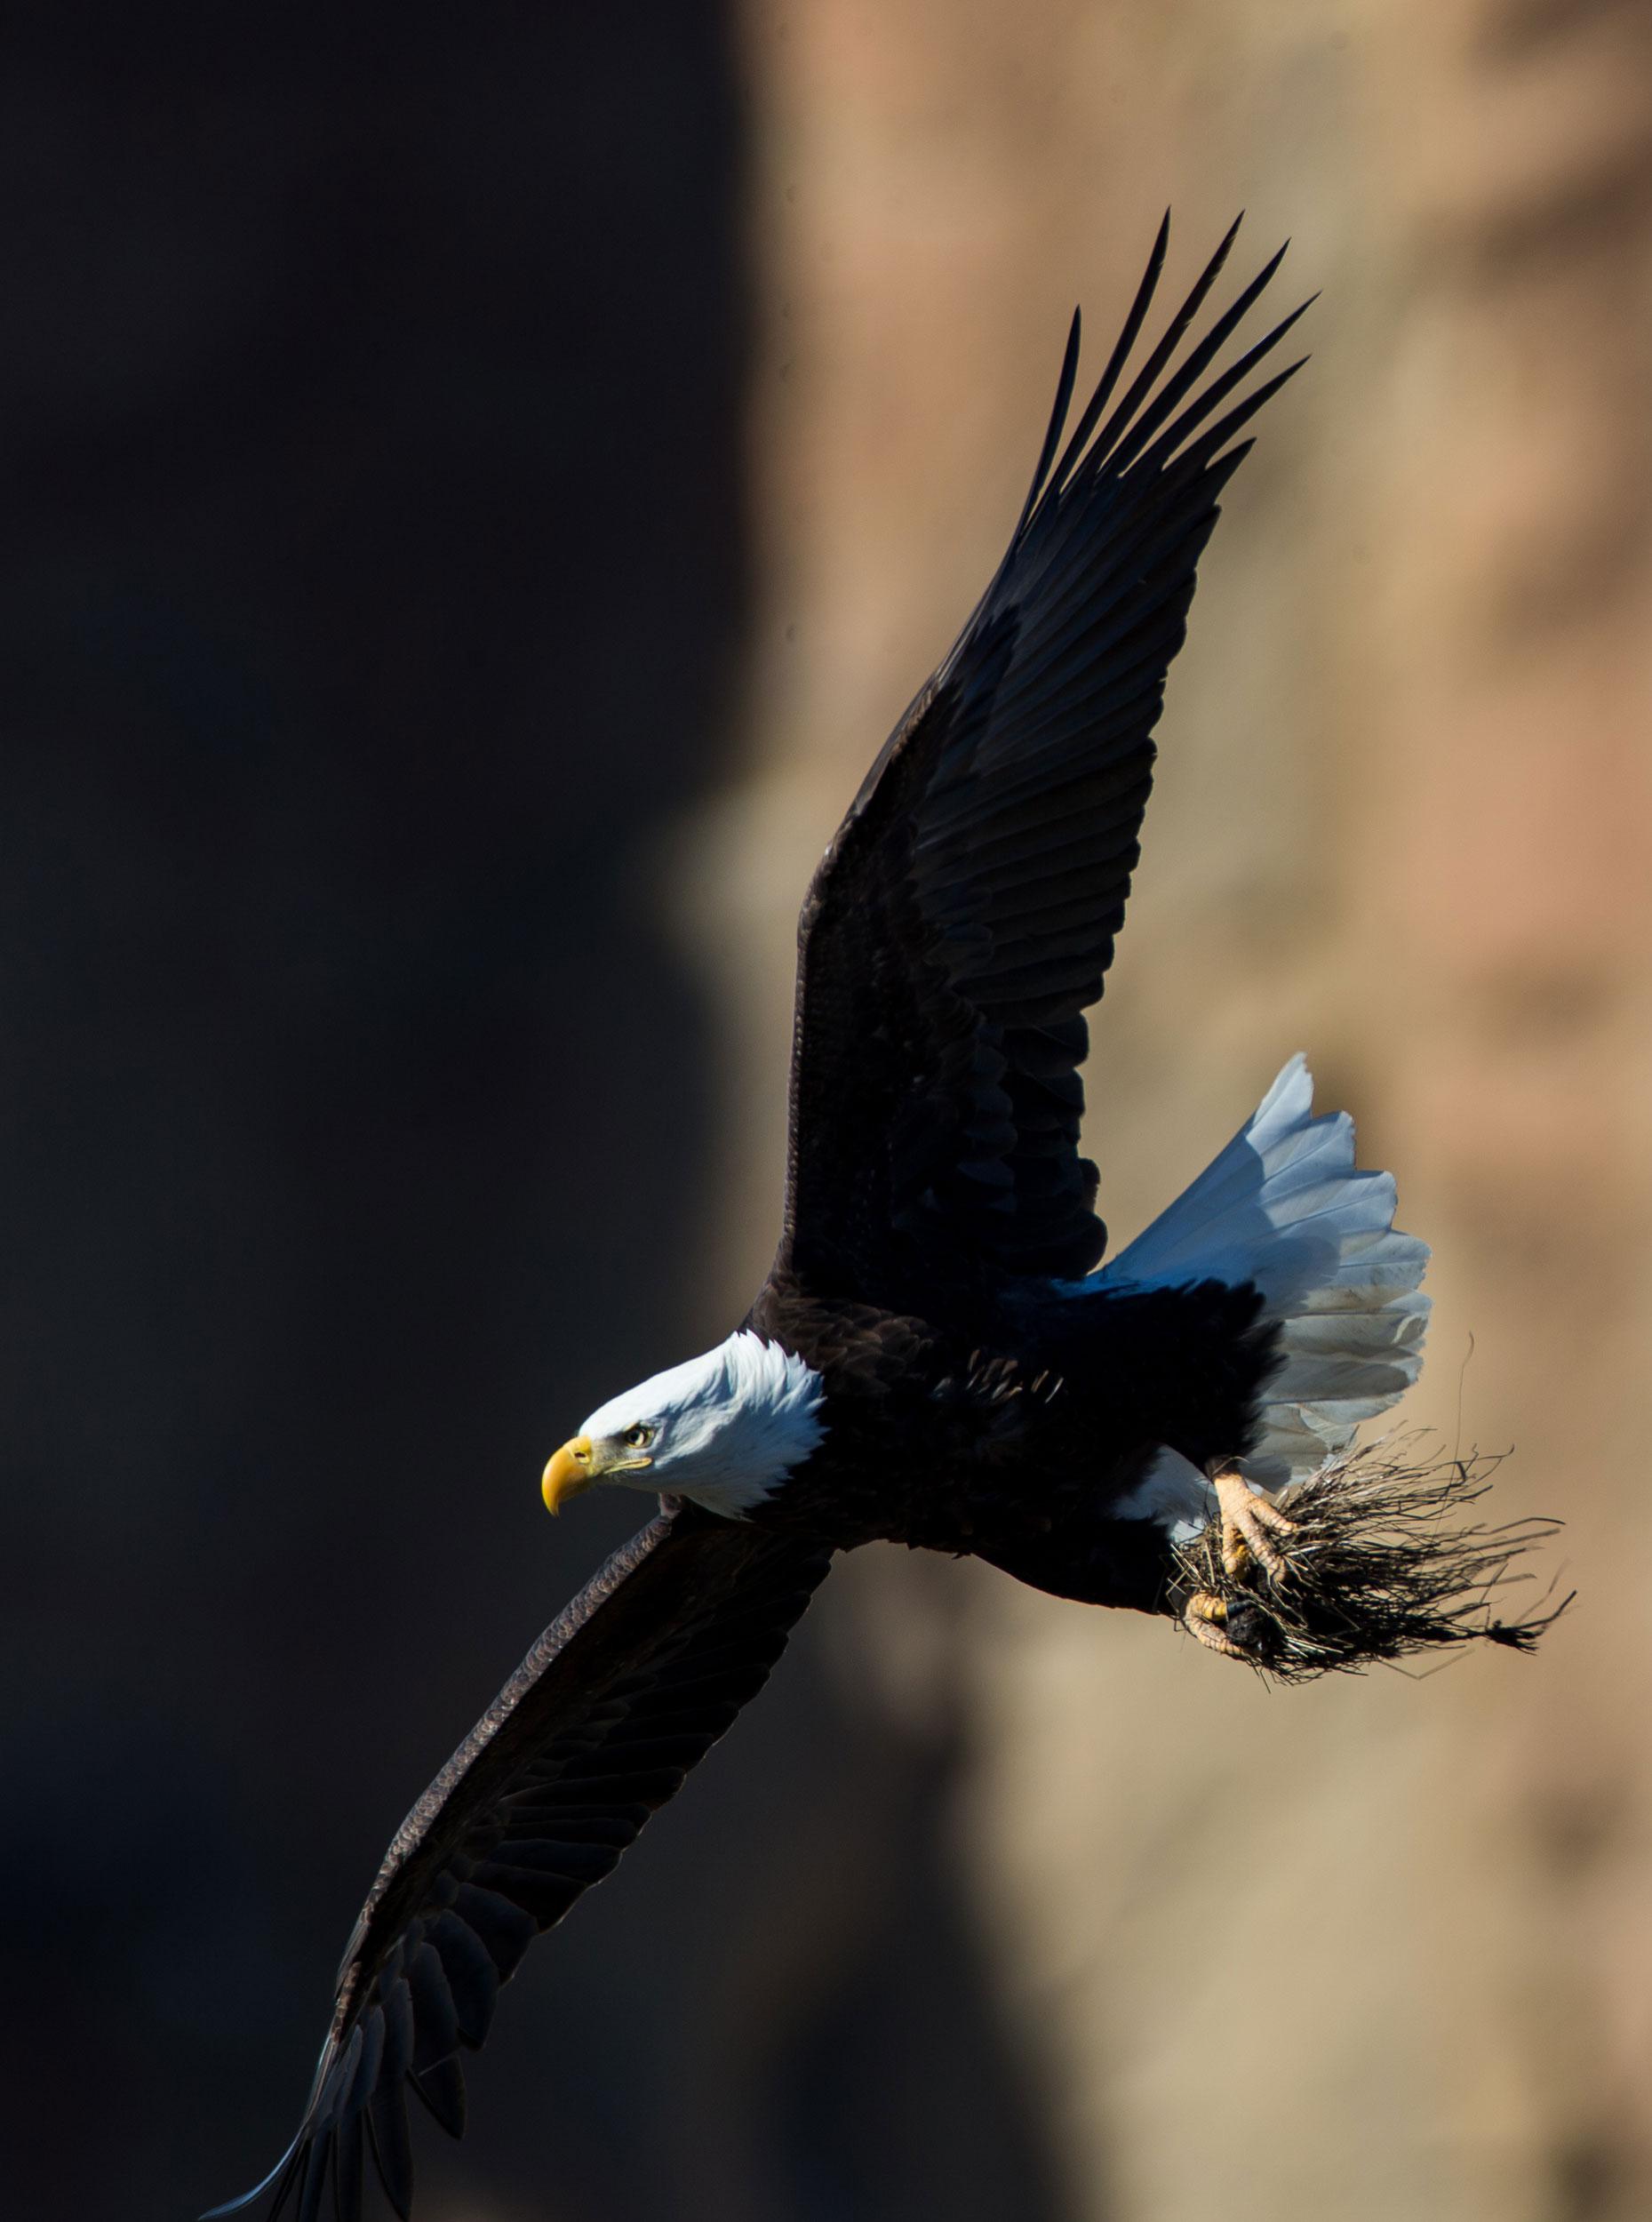 Bald eagle gathering nesting materials. Photo courtesy of Jack Wills.